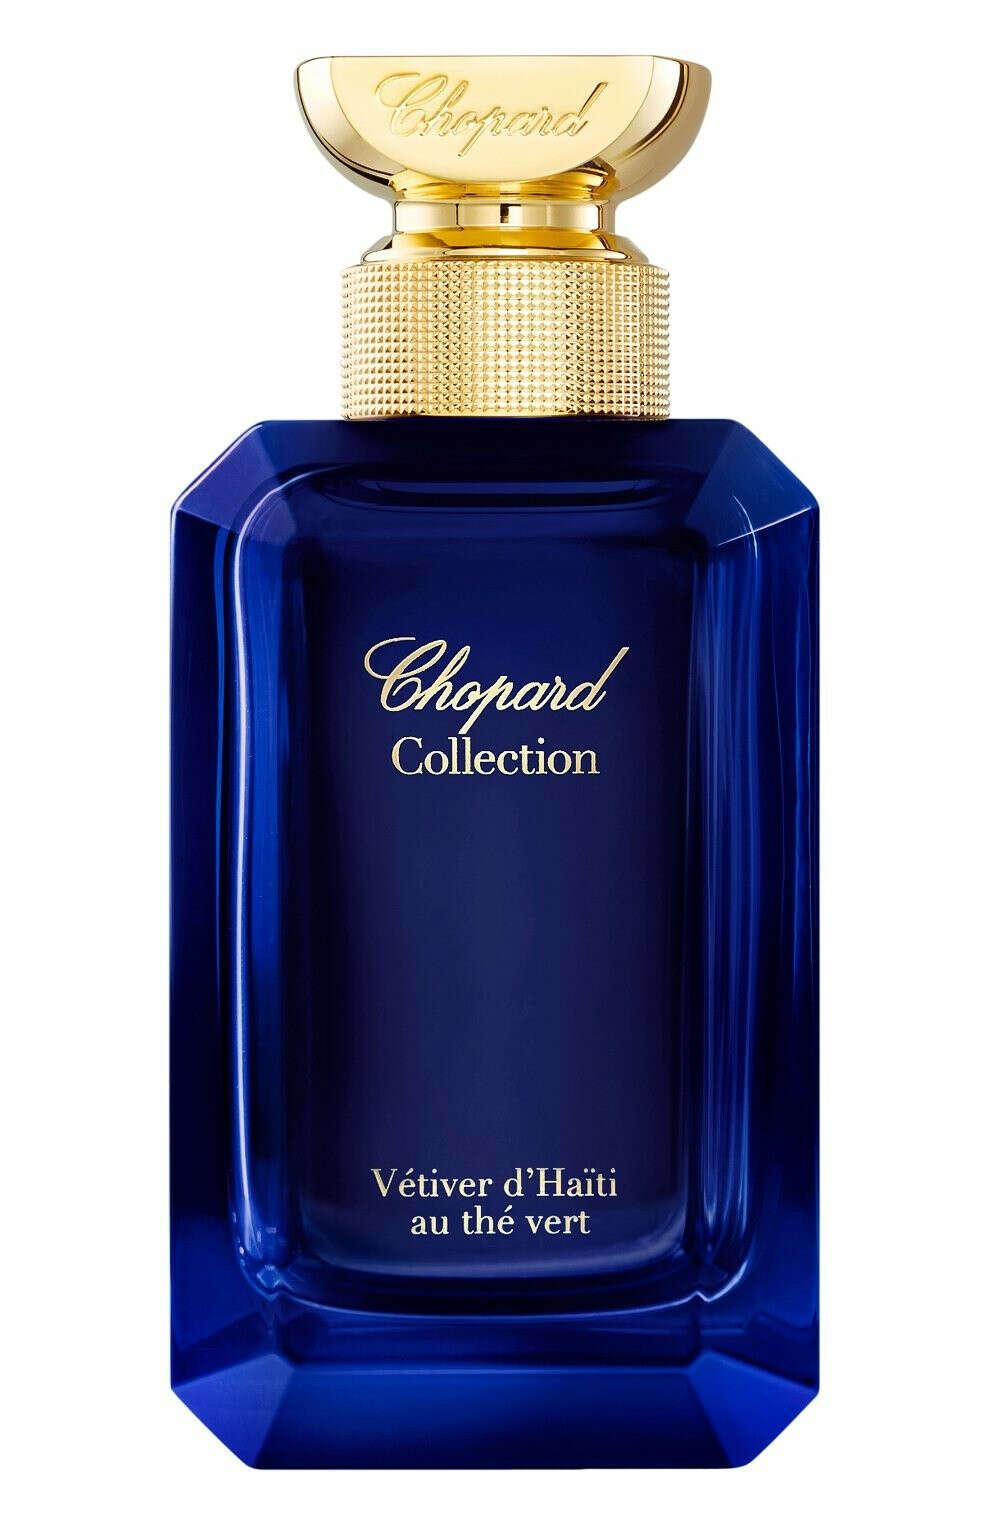 Парфюмерная вода Collection Vetiver d'Haiti au the vert CHOPARD для женщин — купить за 17760 руб. в интернет-магазине ЦУМ, арт. 7640177367426